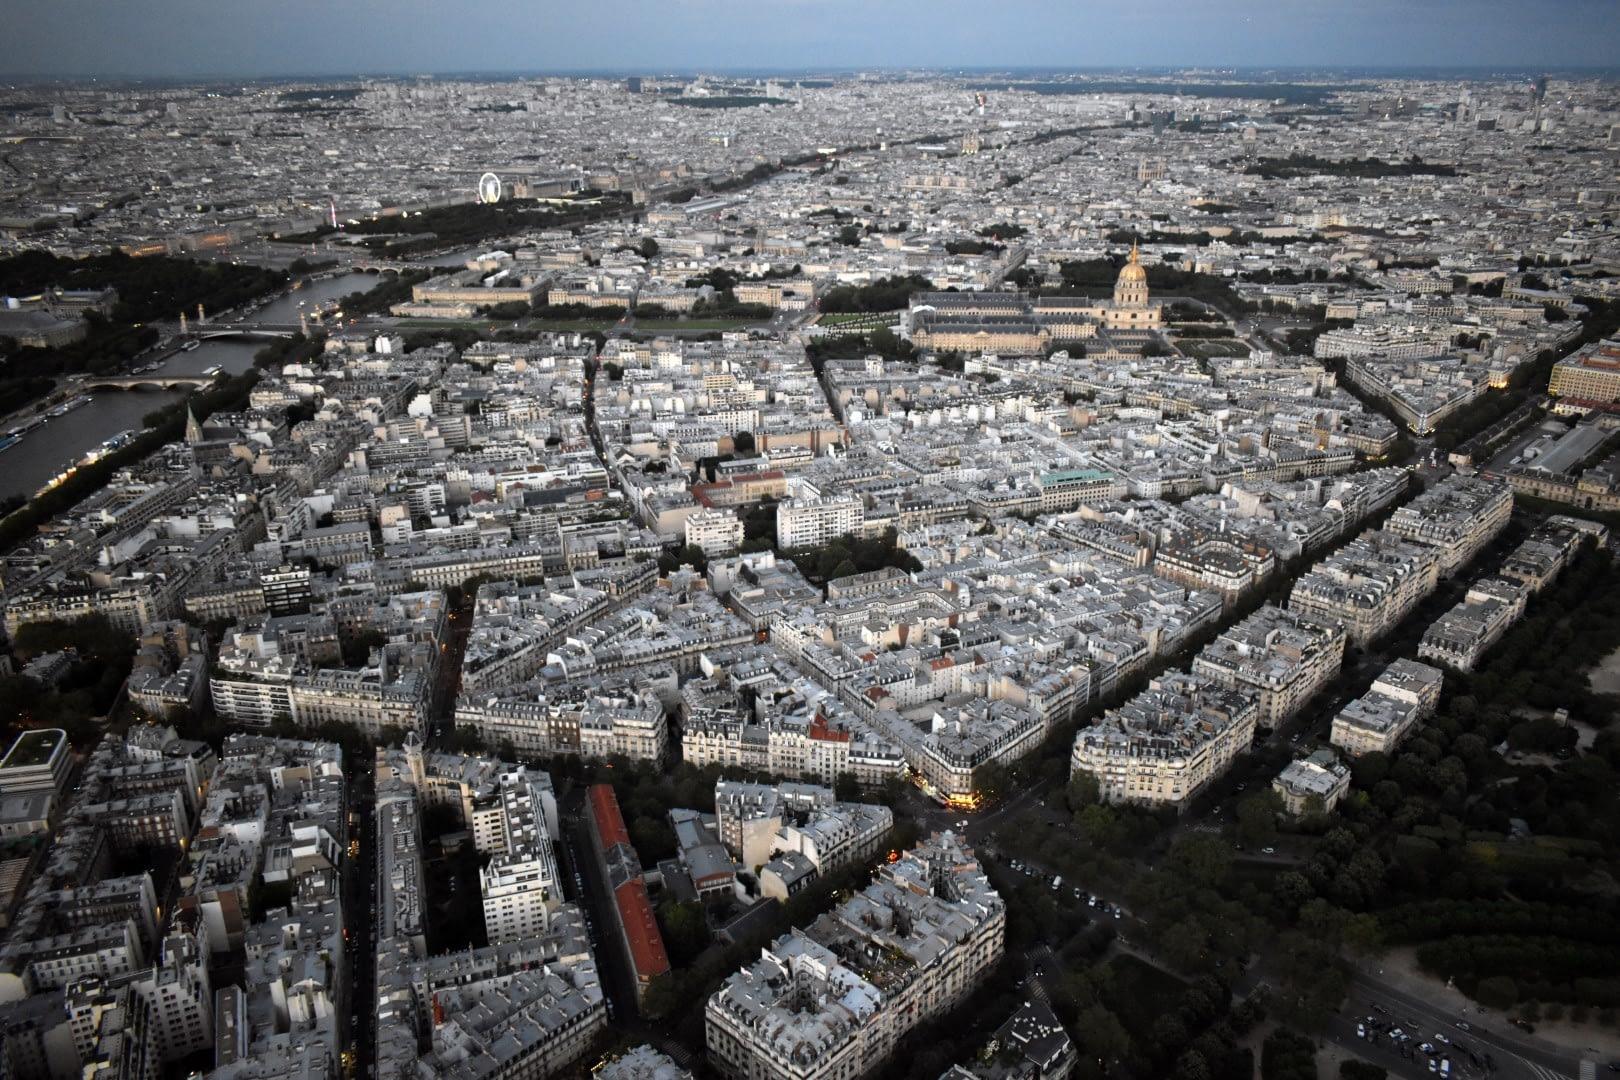 Rive gauche, top of the Eiffel Tower, Paris